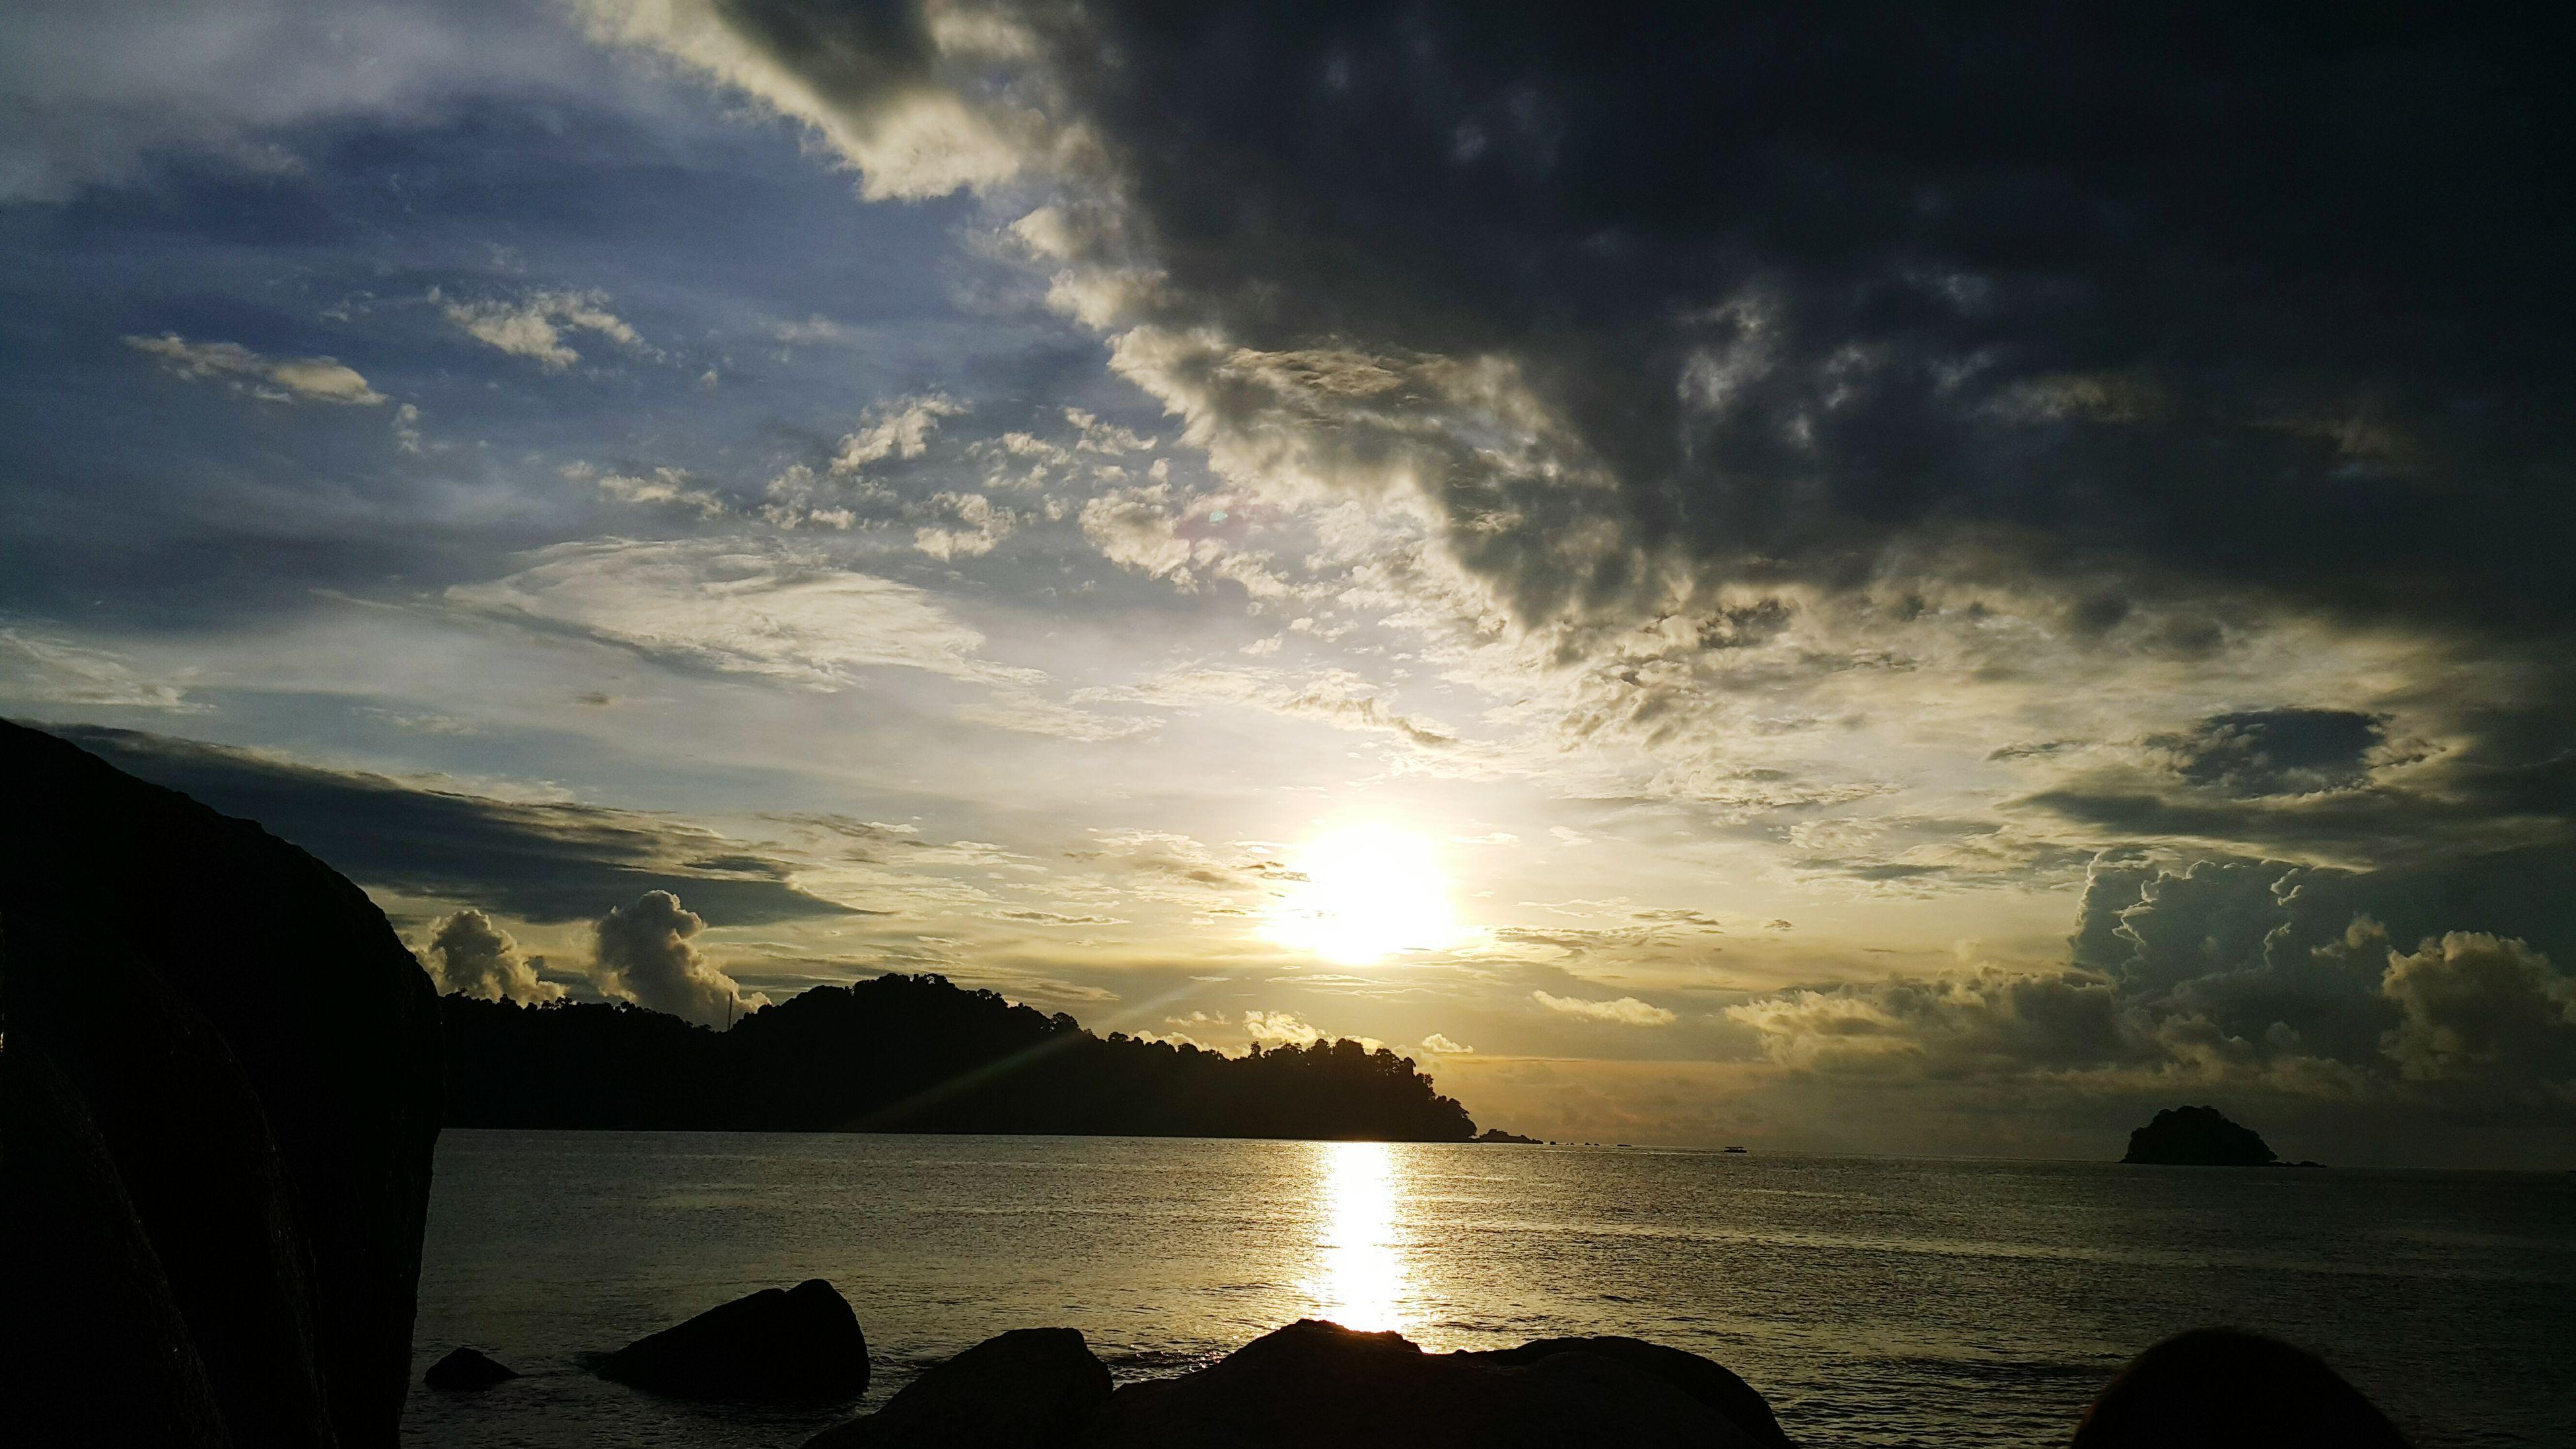 water, sky, sun, scenics, beauty in nature, tranquil scene, tranquility, cloud - sky, sunset, silhouette, sea, sunbeam, nature, mountain, sunlight, idyllic, cloud, reflection, cloudy, lake